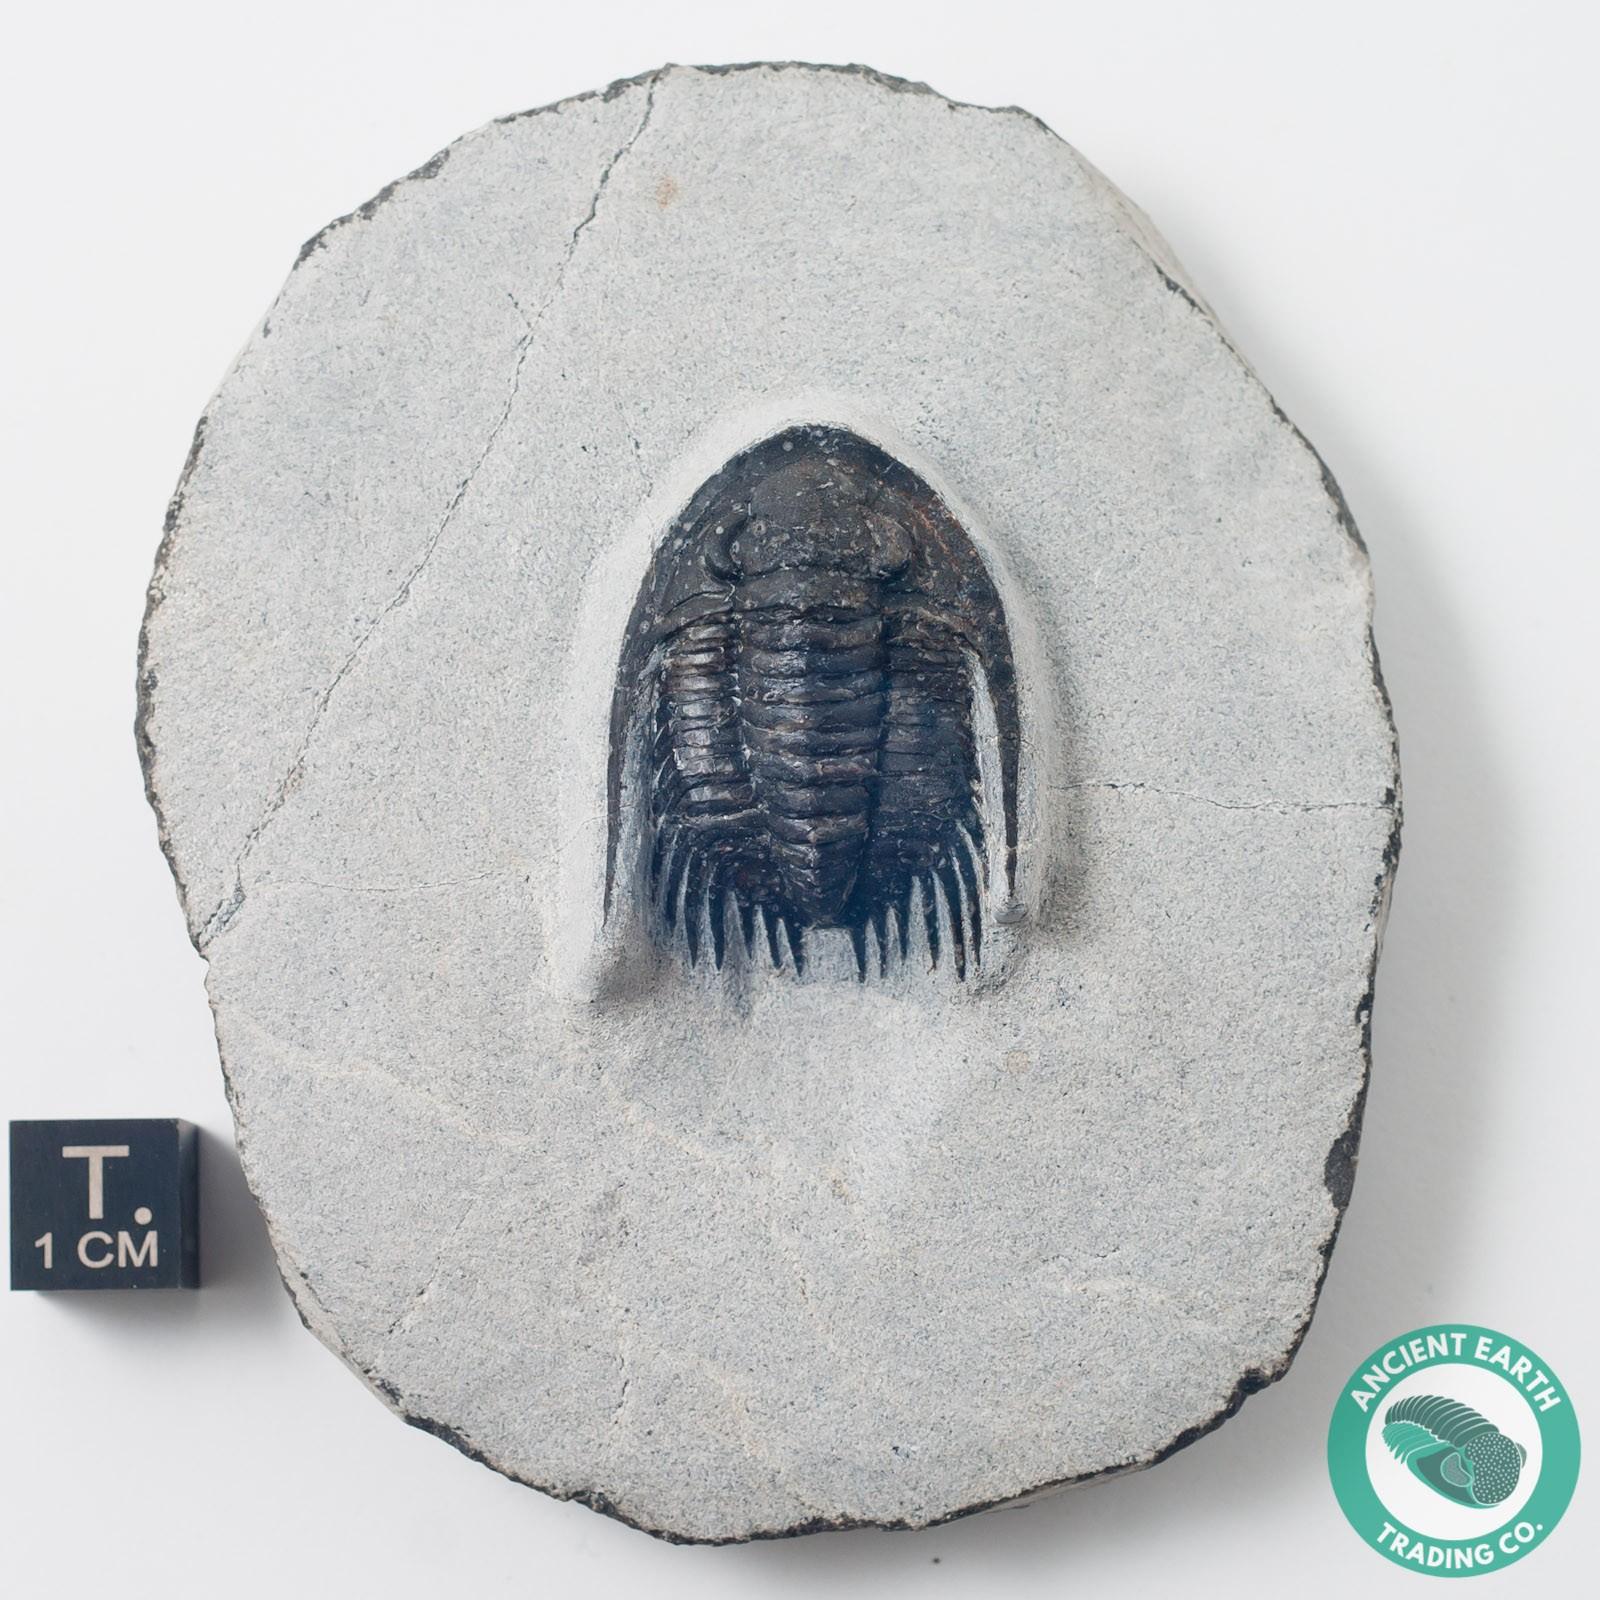 Phaetonellus 1.26 in. Spiny Trilobite Fossil - Morocco